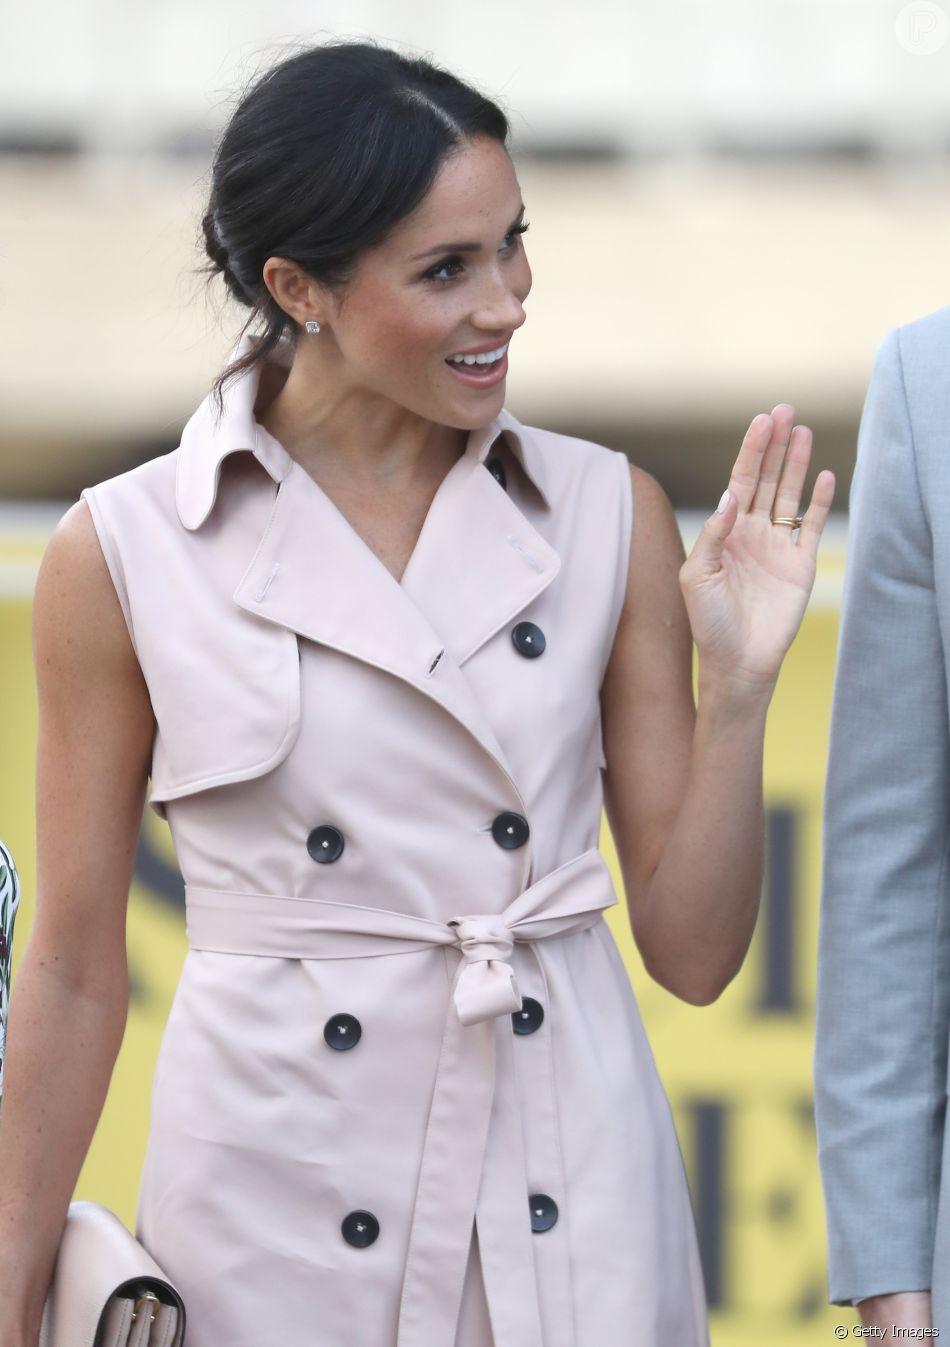 f08b00ecc76b Guarda-roupa milionário: Meghan Markle usou vestido-trench da marca House  of Nonie